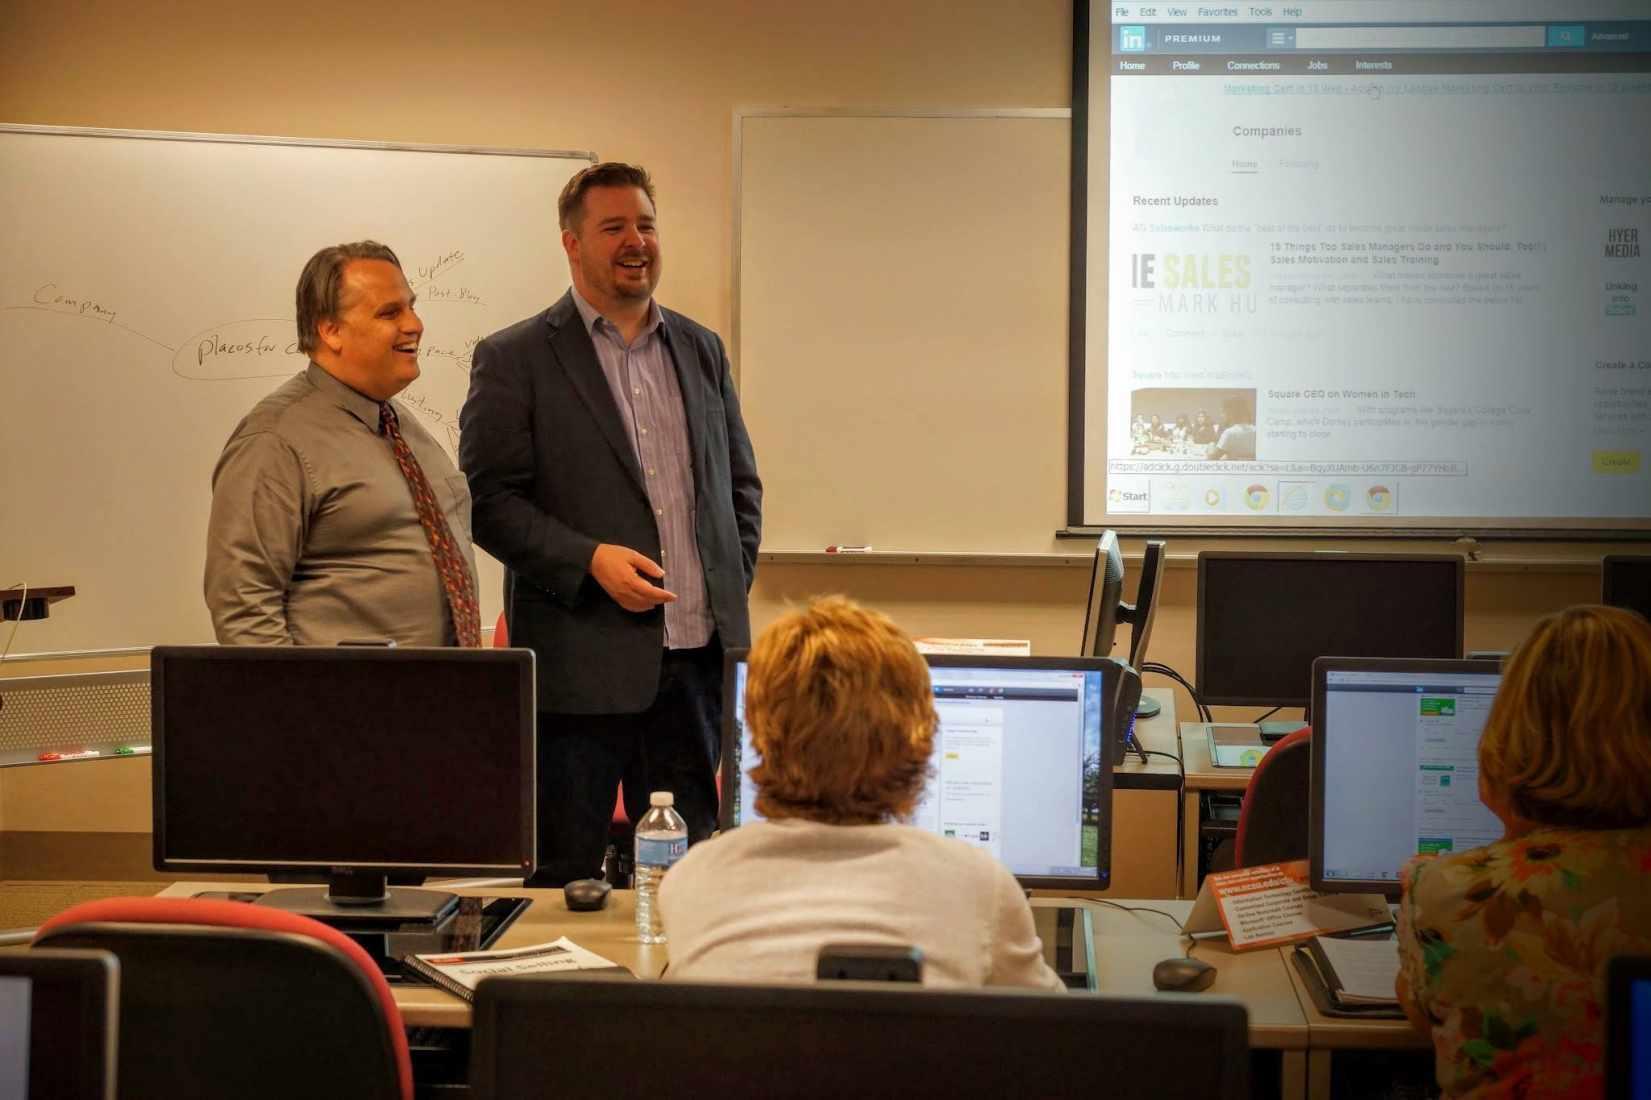 Greg Hyer and Martin Brossman teaching at NC State TTS